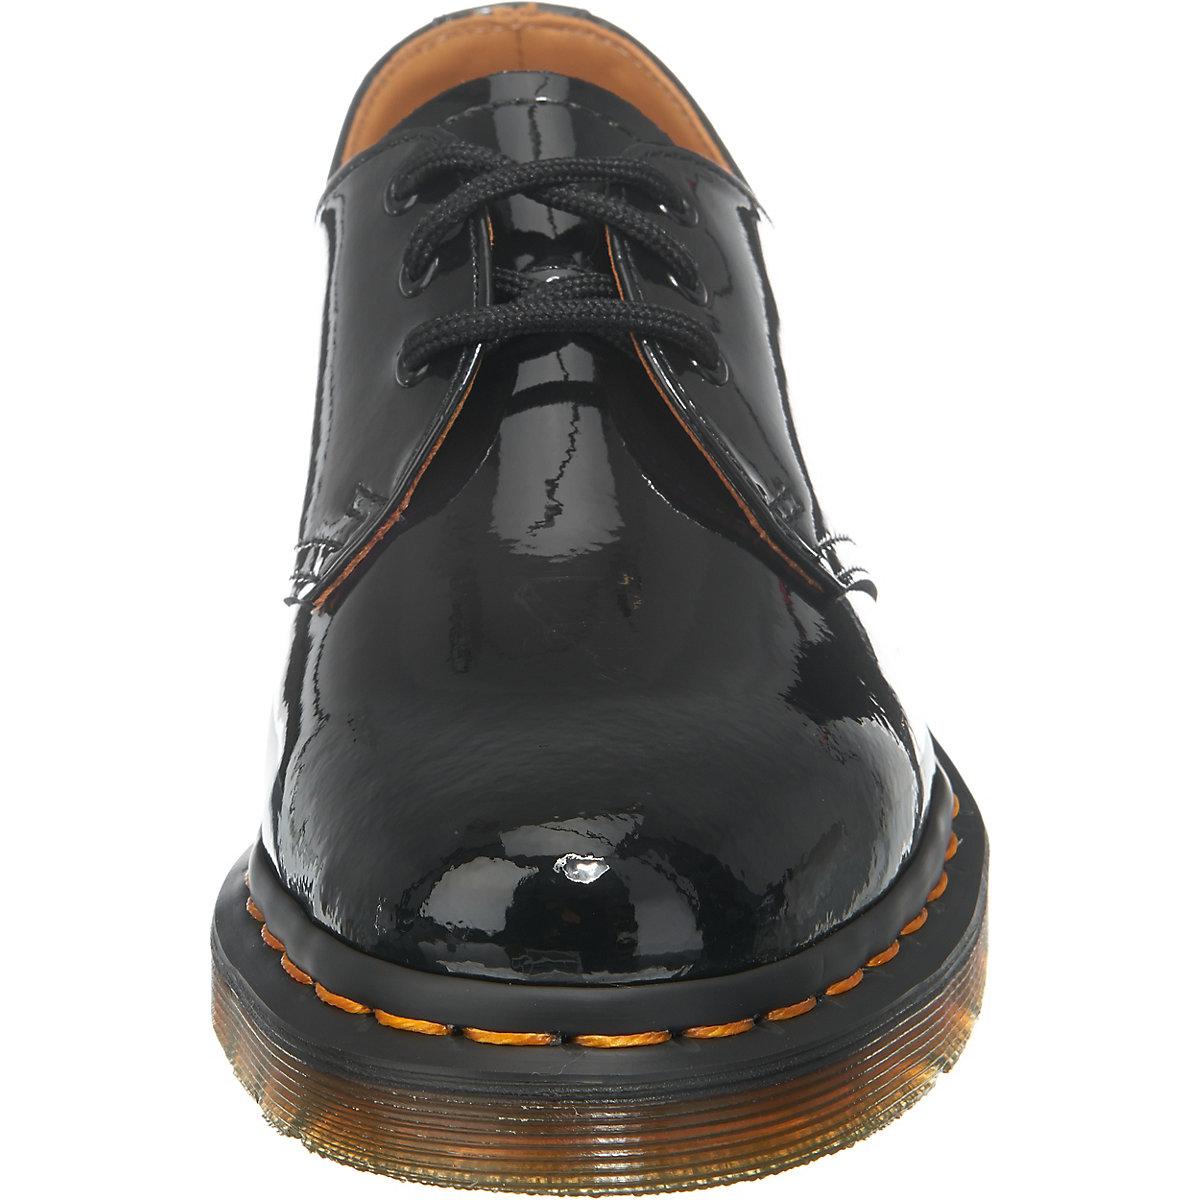 dr martens 1461 patent black klassische halbschuhe schwarz mirapodo. Black Bedroom Furniture Sets. Home Design Ideas